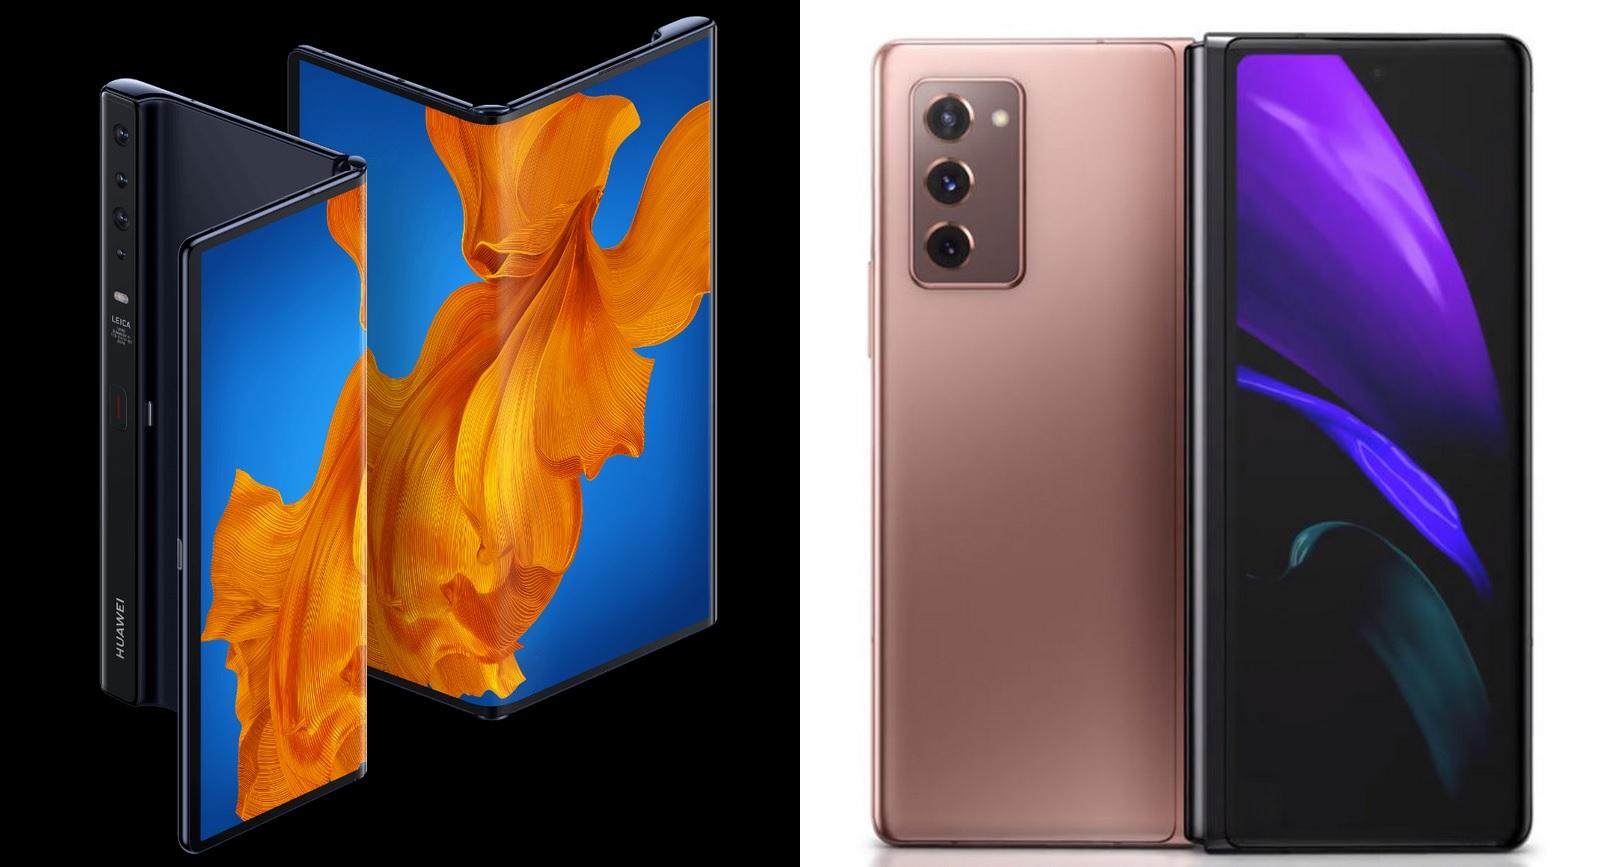 گوشی Galaxy Z Fold 2 و Mate Xs